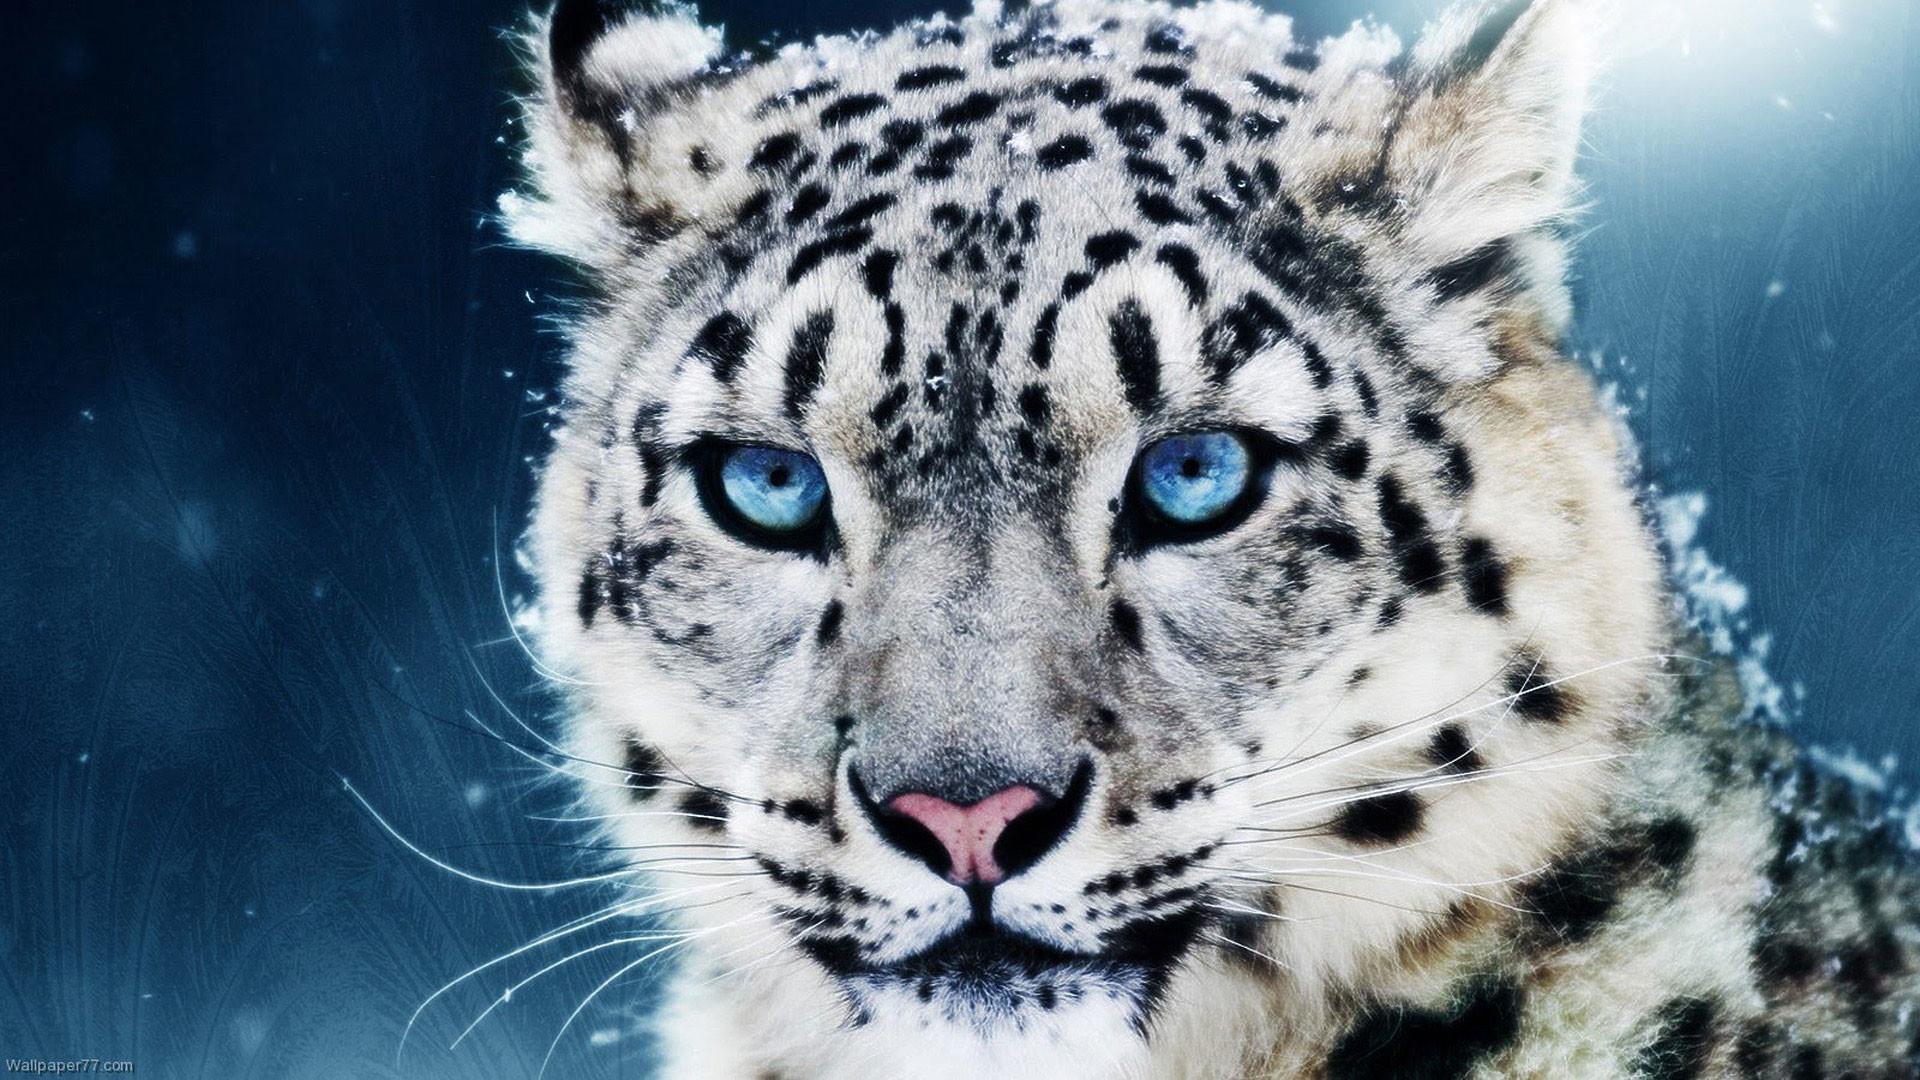 hd pics photos animals cool tiger snow desktop background wallpaper